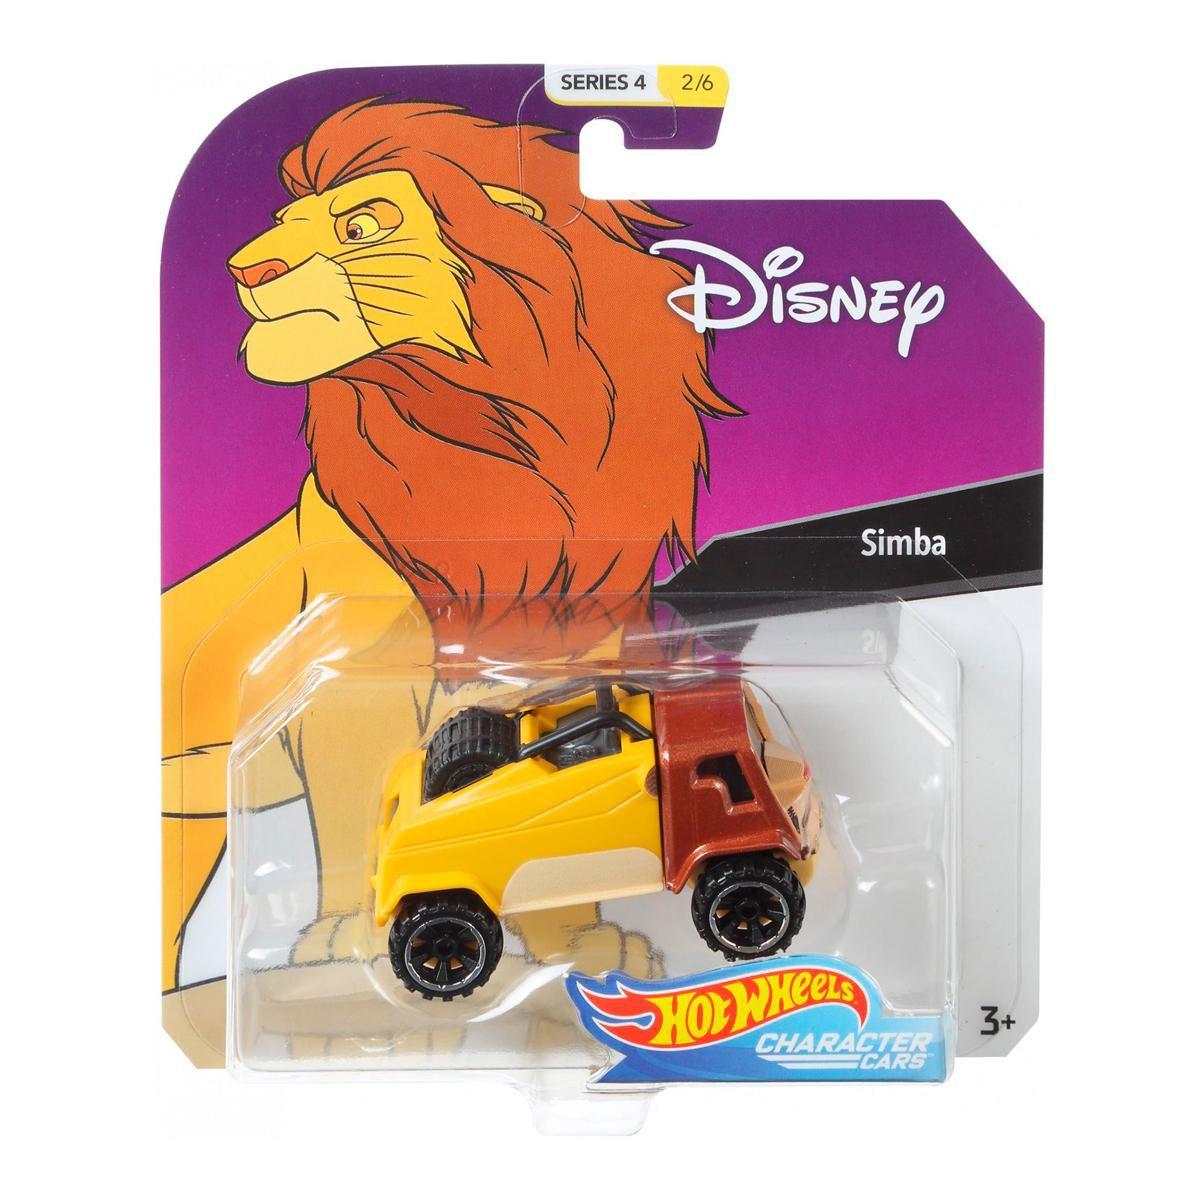 Carrinho Hot Wheels Simba: Disney (Series4) - Mattel